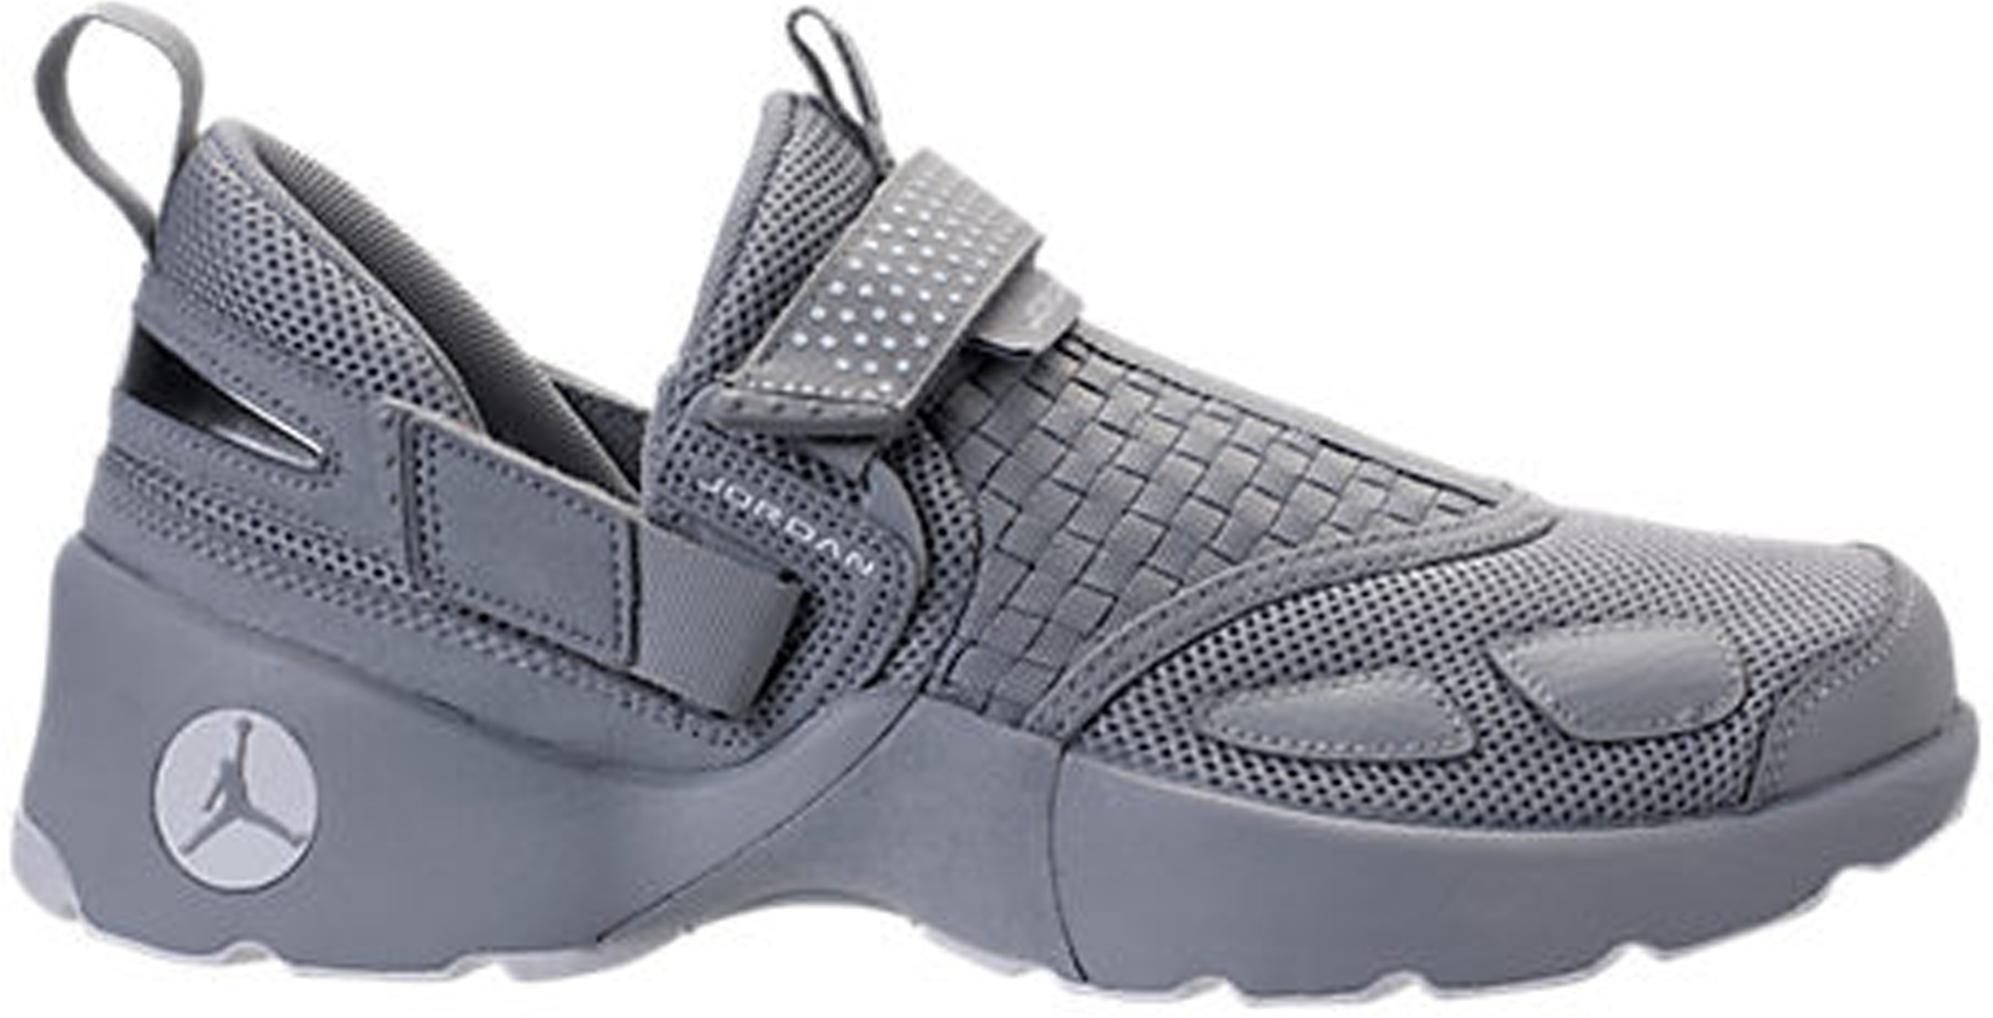 Jordan Trunner LX Wolf Grey